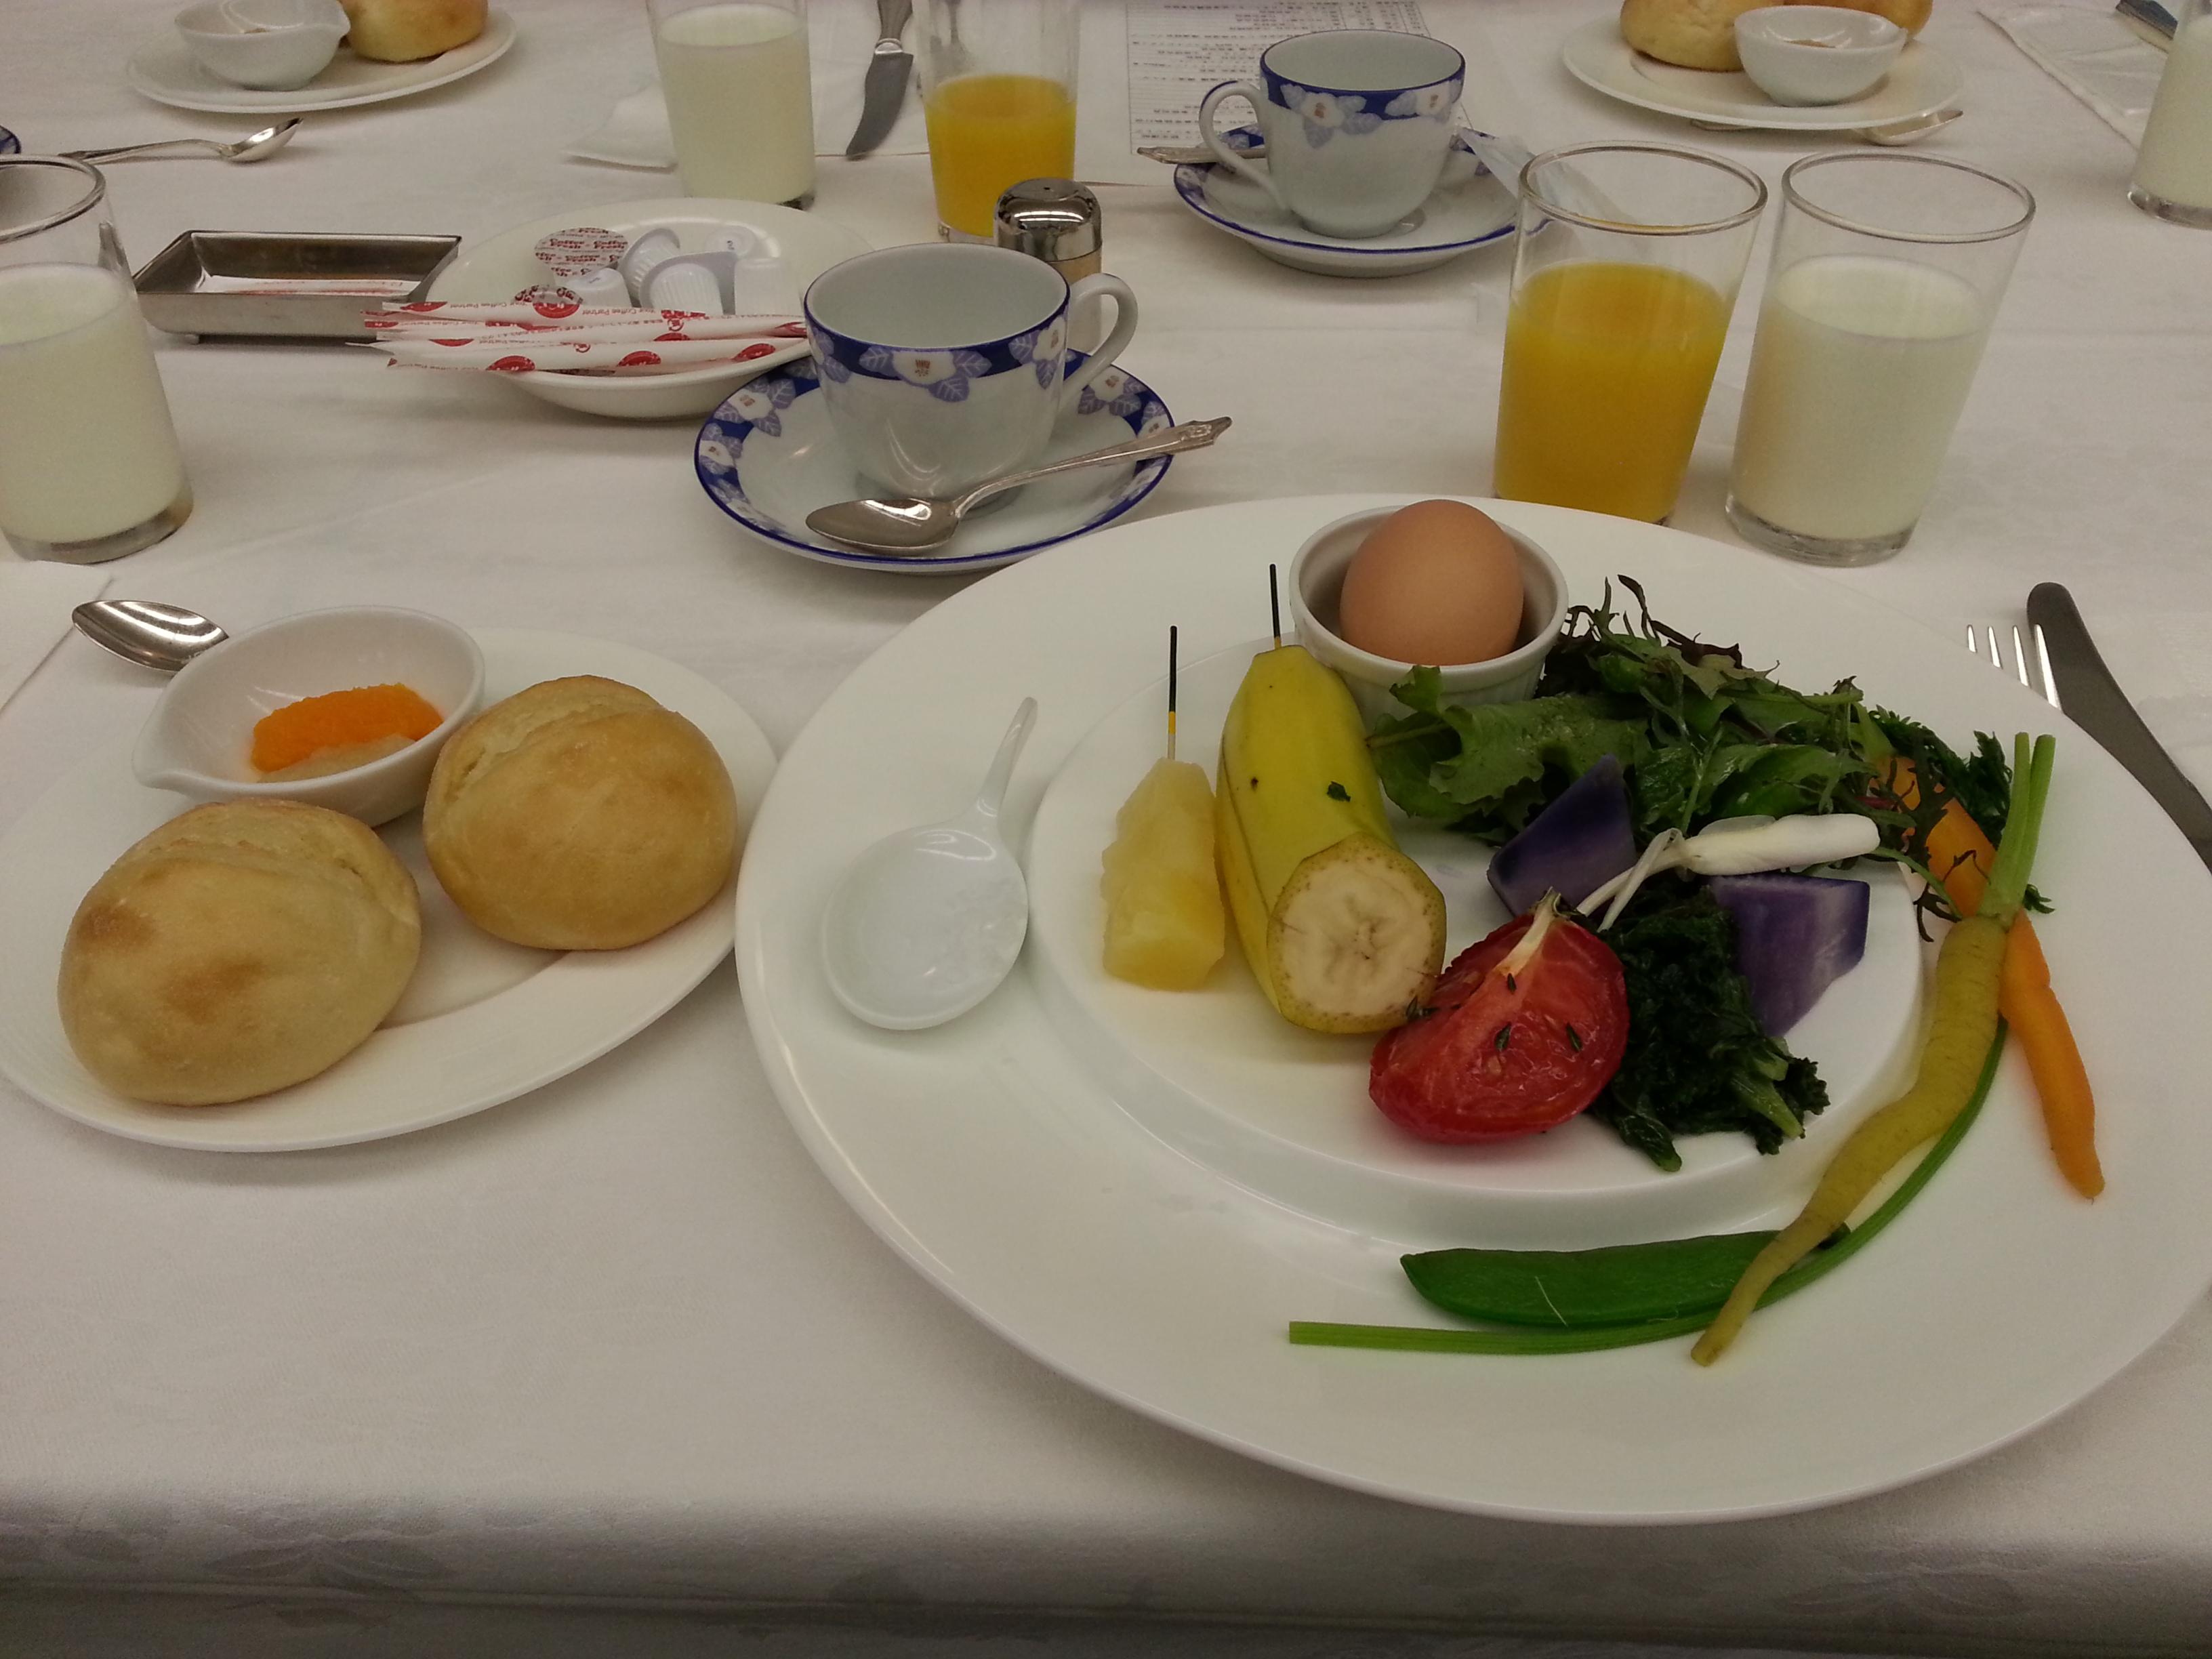 昭和女子大学理事長の坂東眞理子氏が講演、第4回エシカル朝食会開催